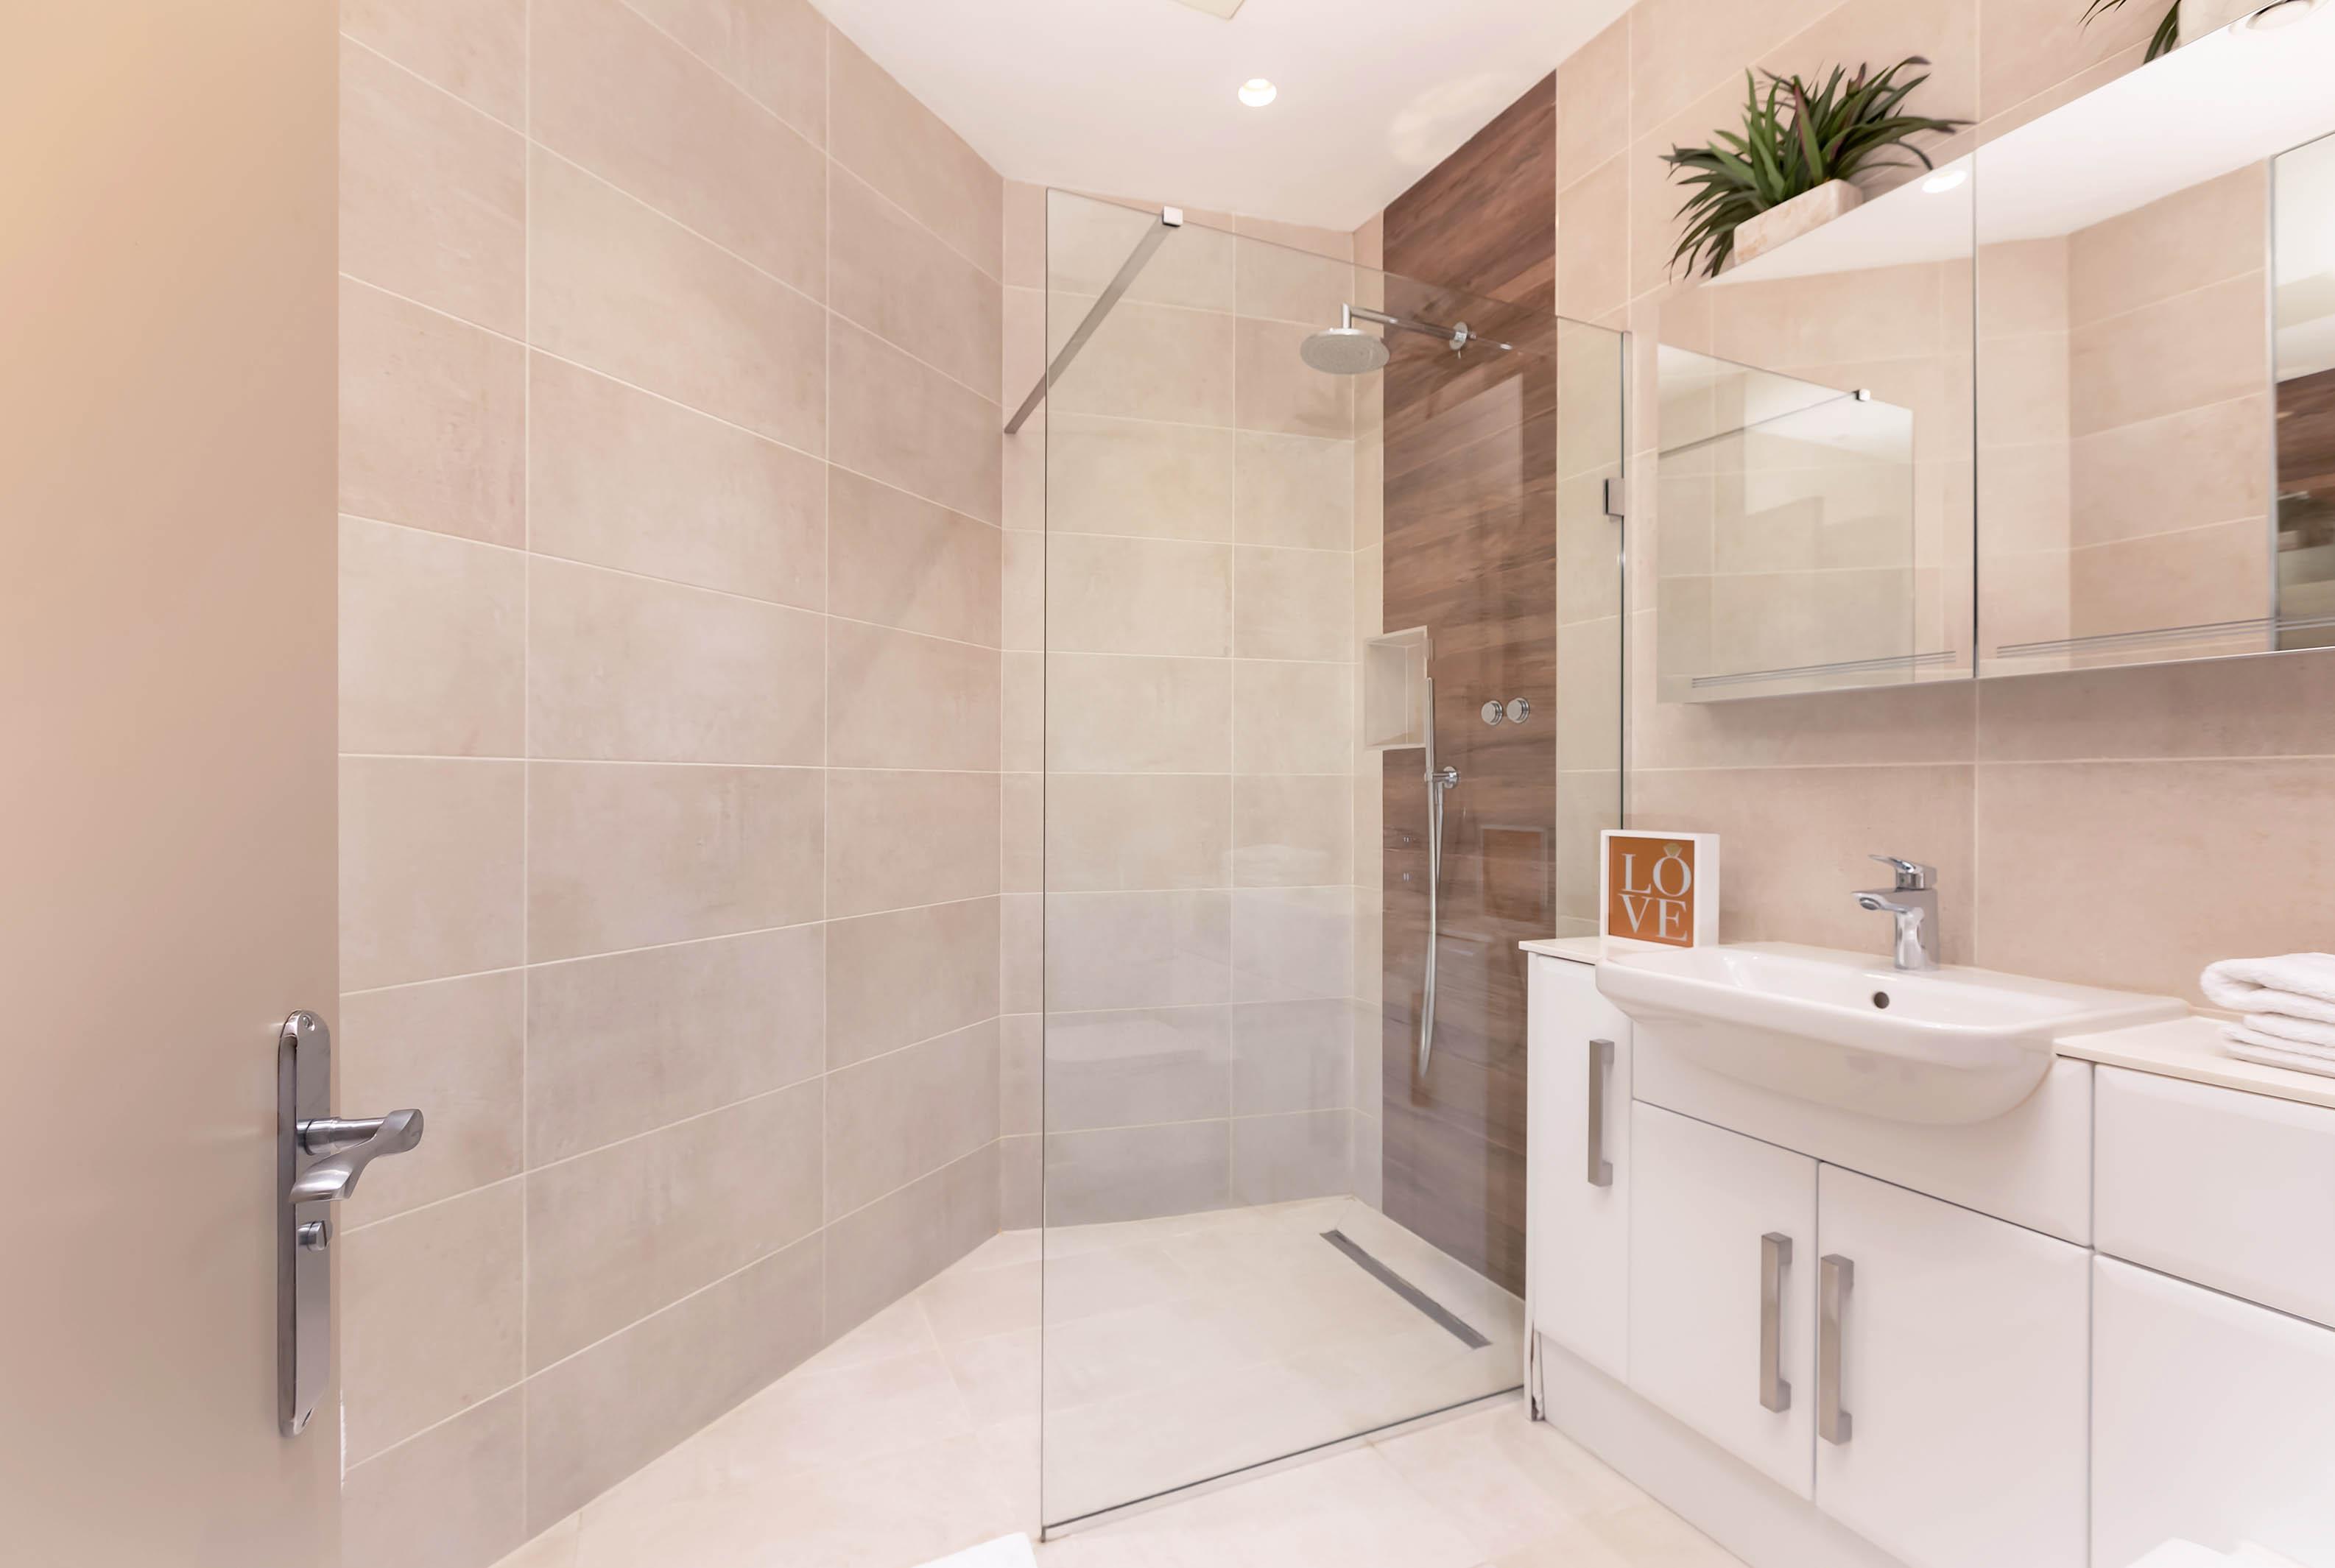 Lovelydays luxury service apartment rental - London - Fitzrovia - Wells Mews B - Lovelysuite - 2 bedrooms - 2 bathrooms - Lovely shower - d5f7378a89df - Lovelydays